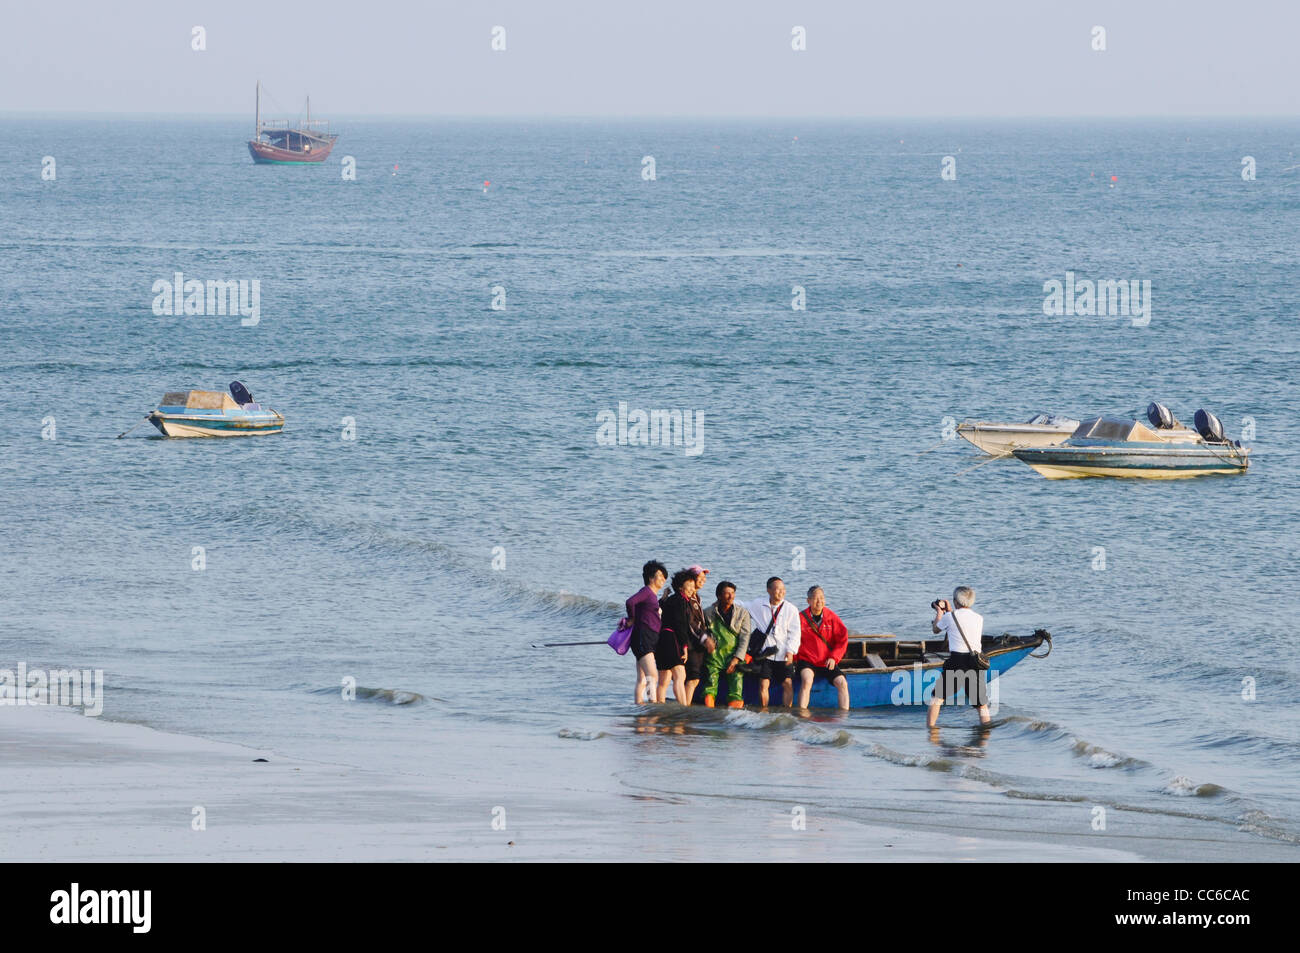 Tourists taking photos, South China Sea, Beihai, Guangxi , China - Stock Image